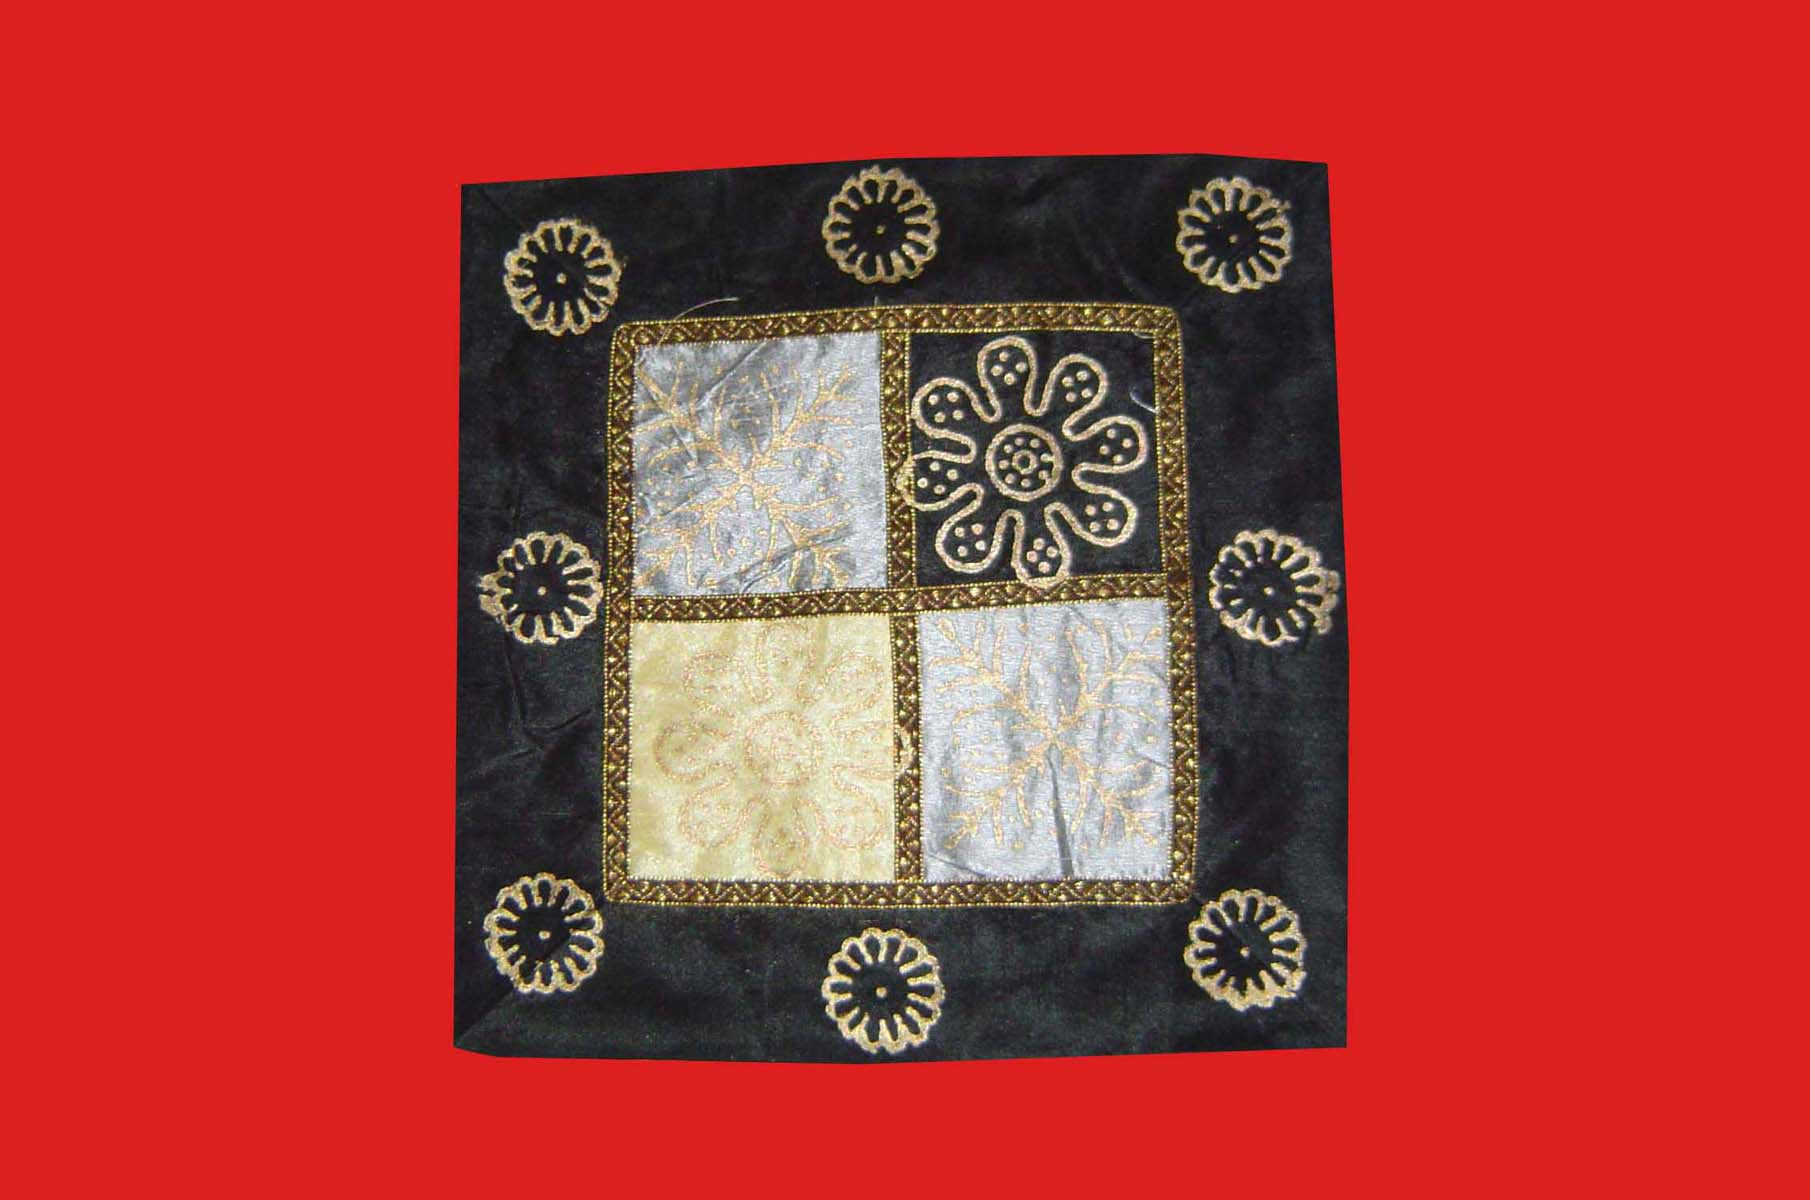 Kashmir Artizan Udaipur Cushion Covers Sofa Cushions  : 20 from indianpurepashmina.com size 1810 x 1200 jpeg 123kB